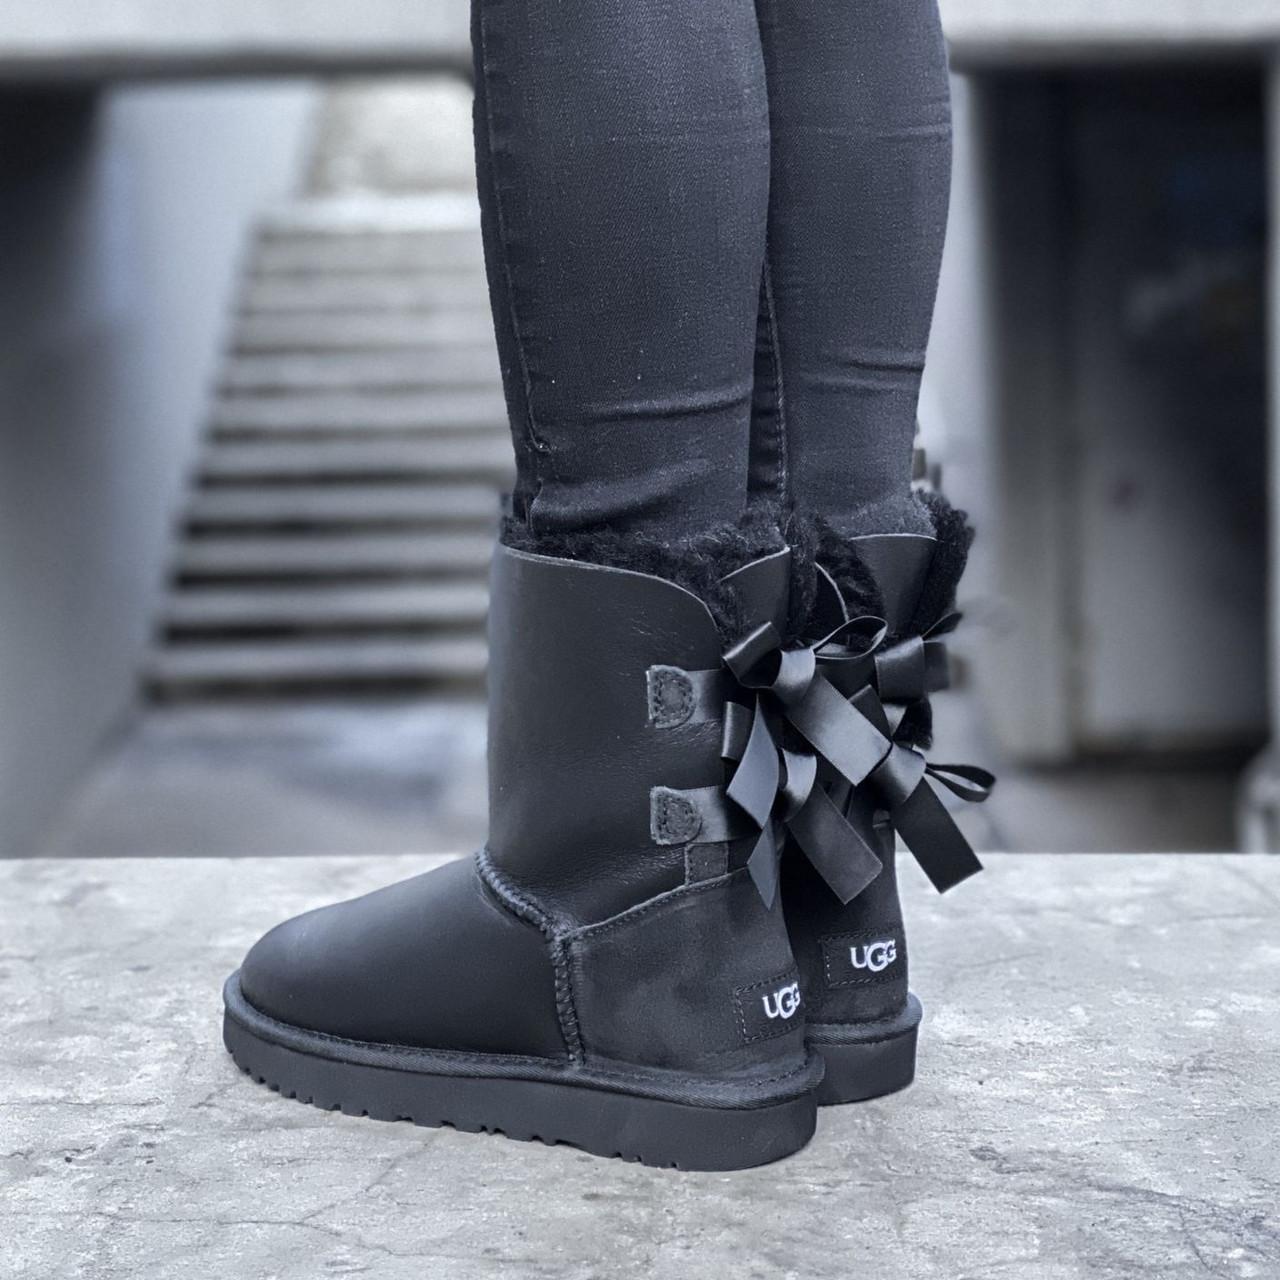 Угги женские в стиле UGG Australia Bailey Bow II Black